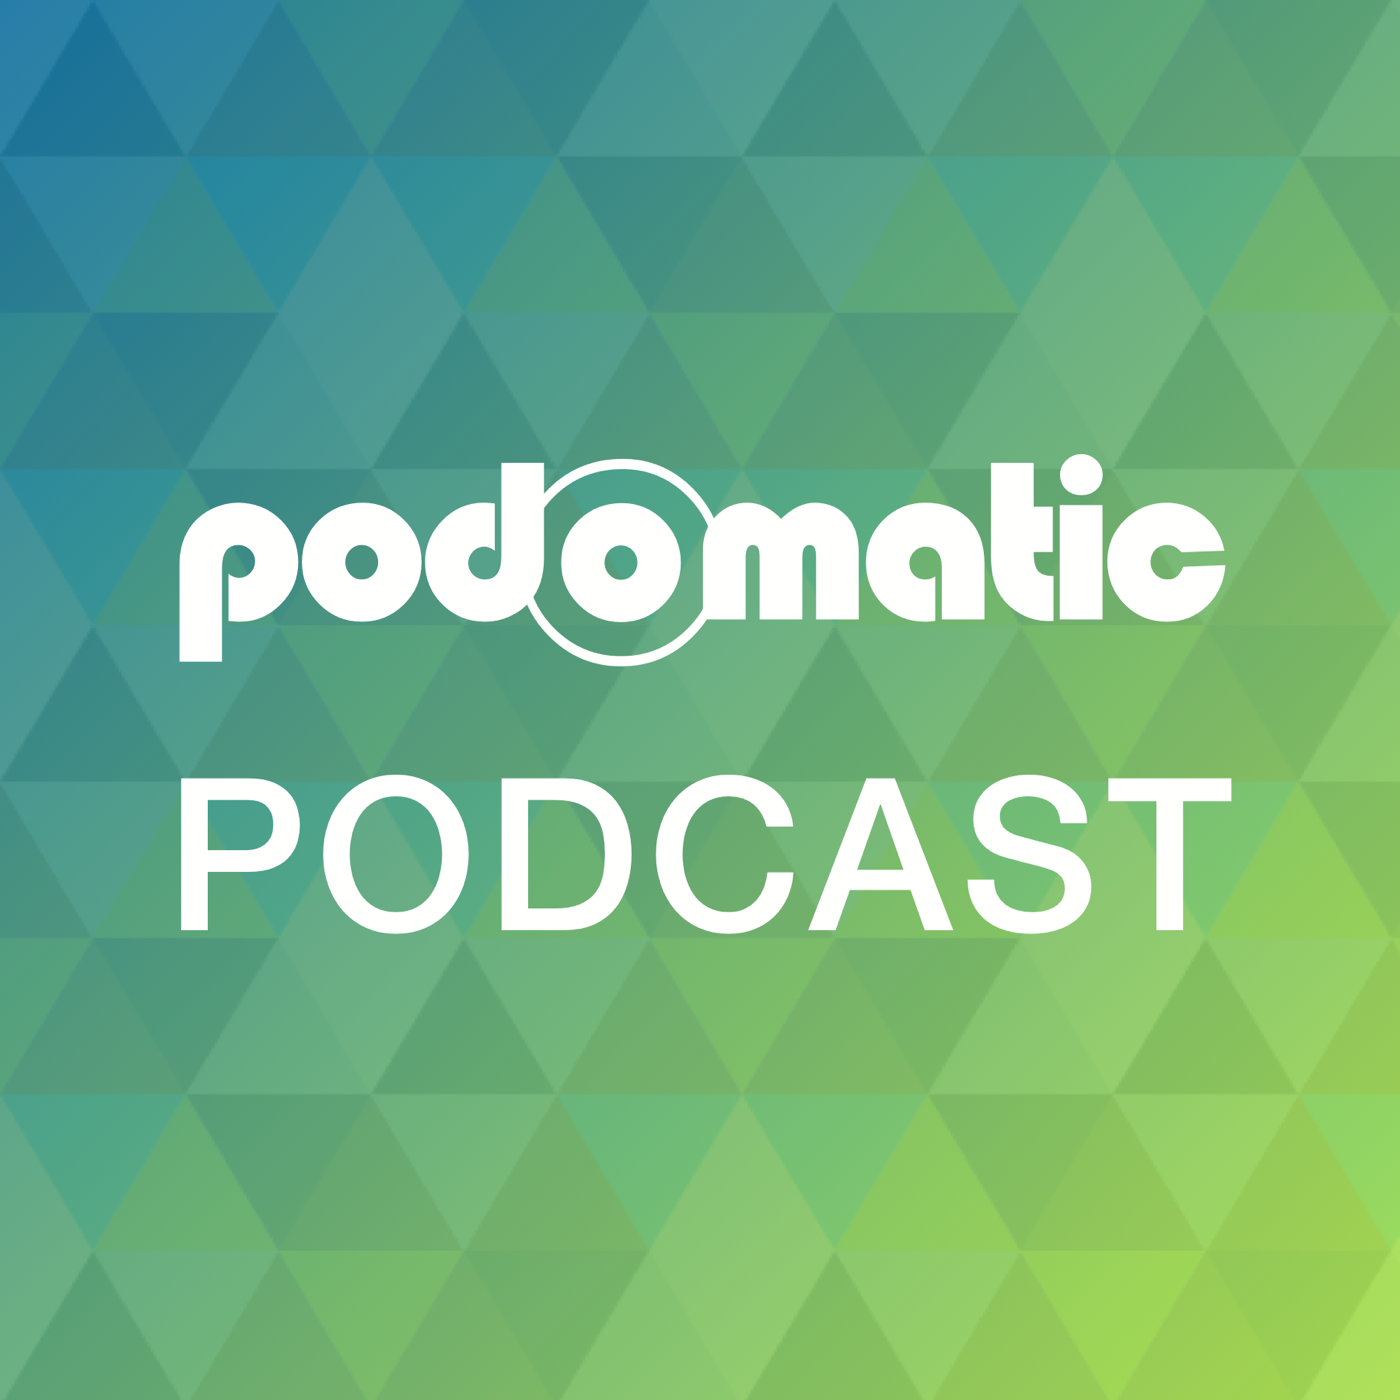 Jonathan Bucciachio's Podcast